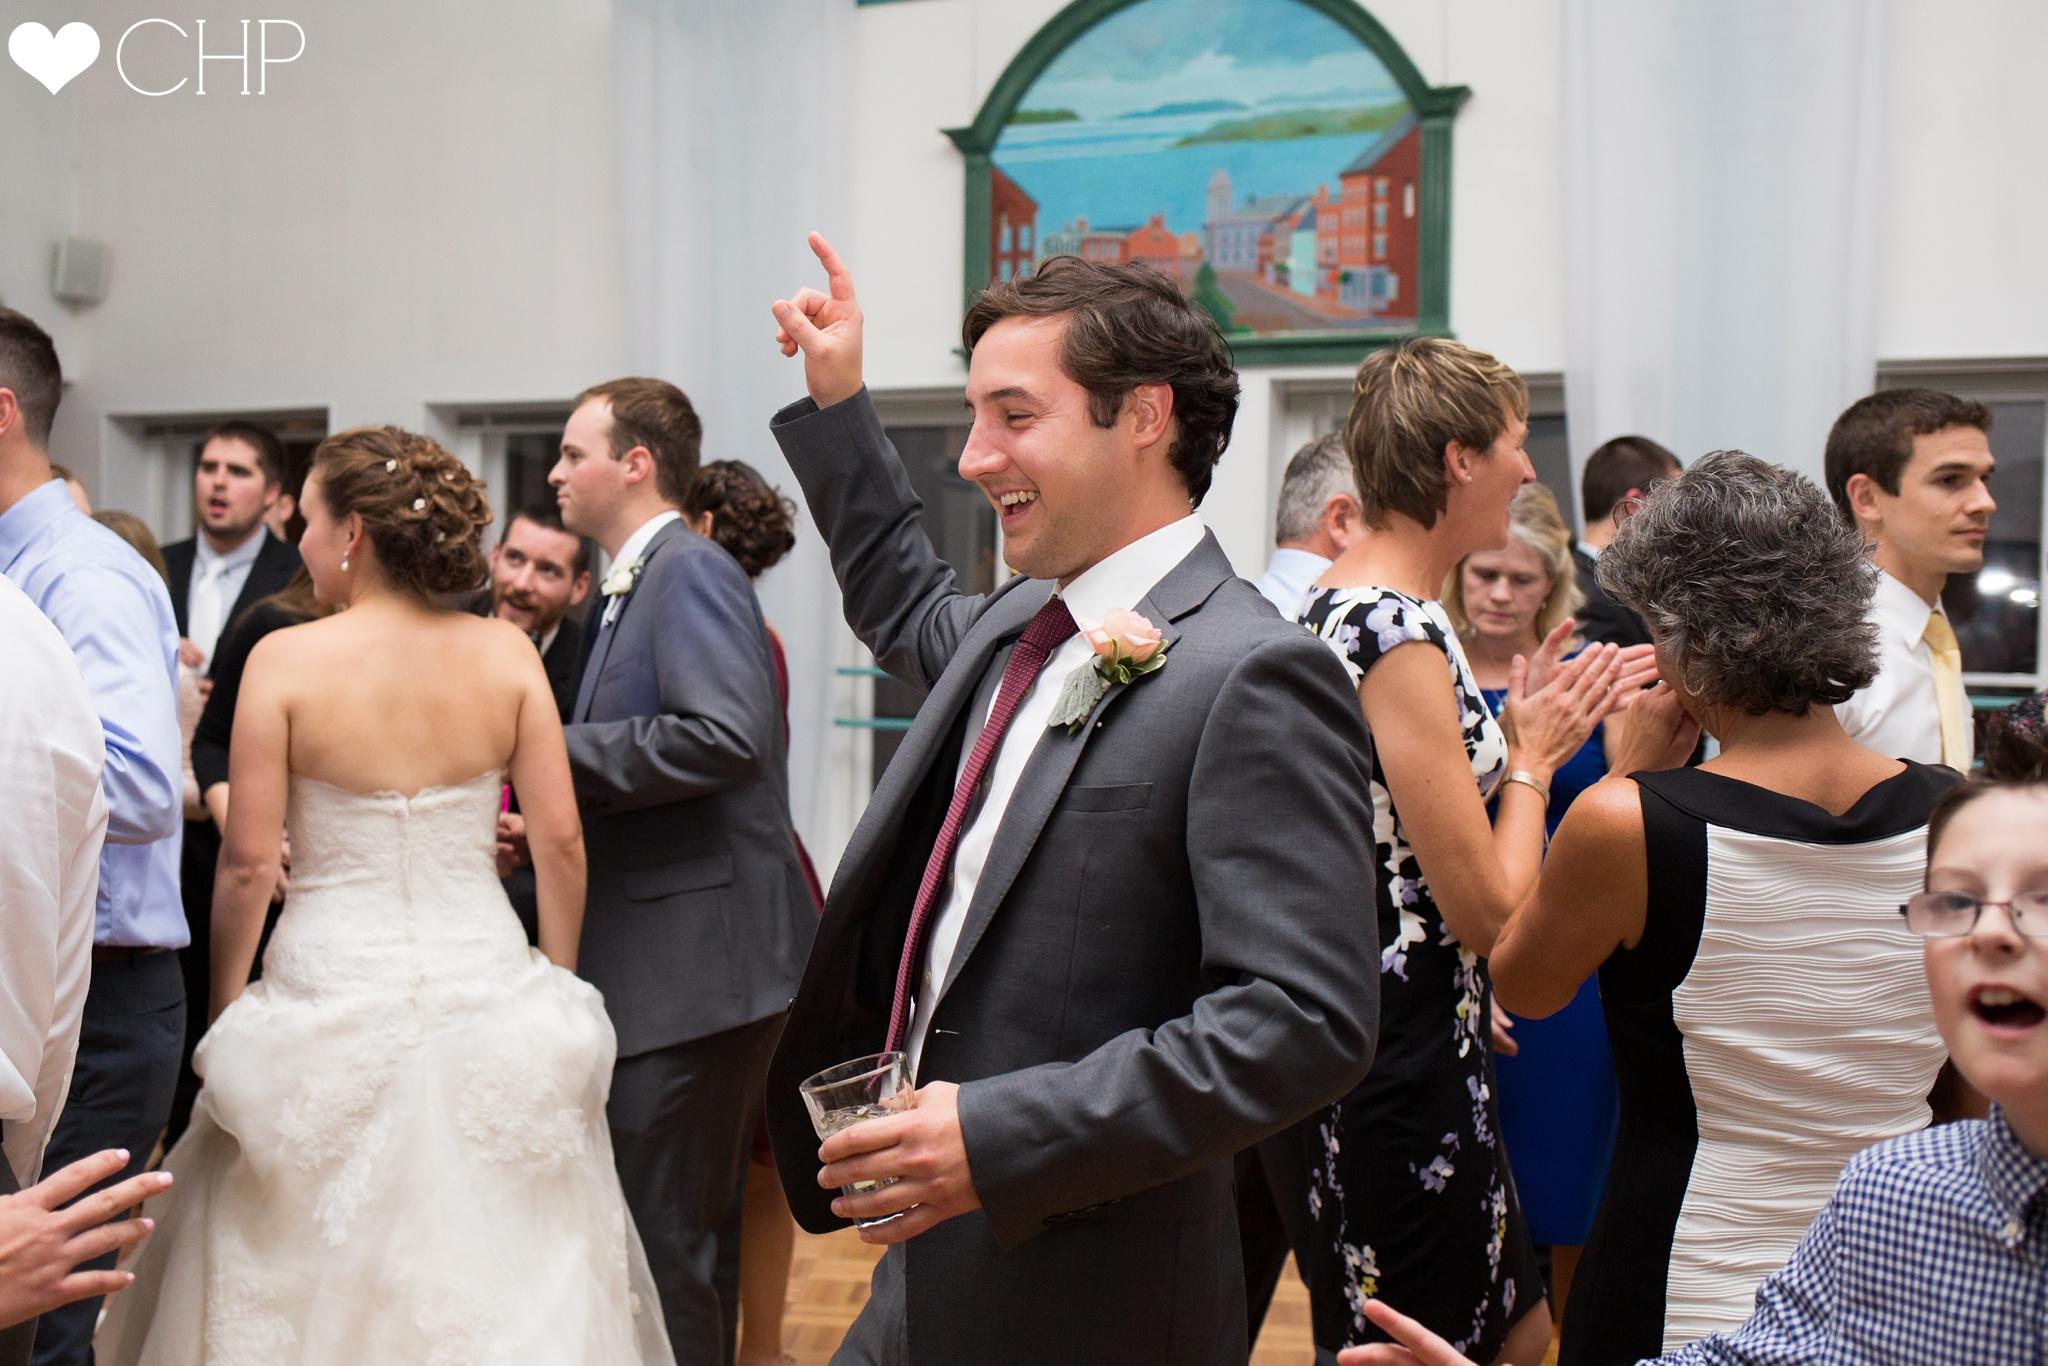 Old Port ME Wedding reception